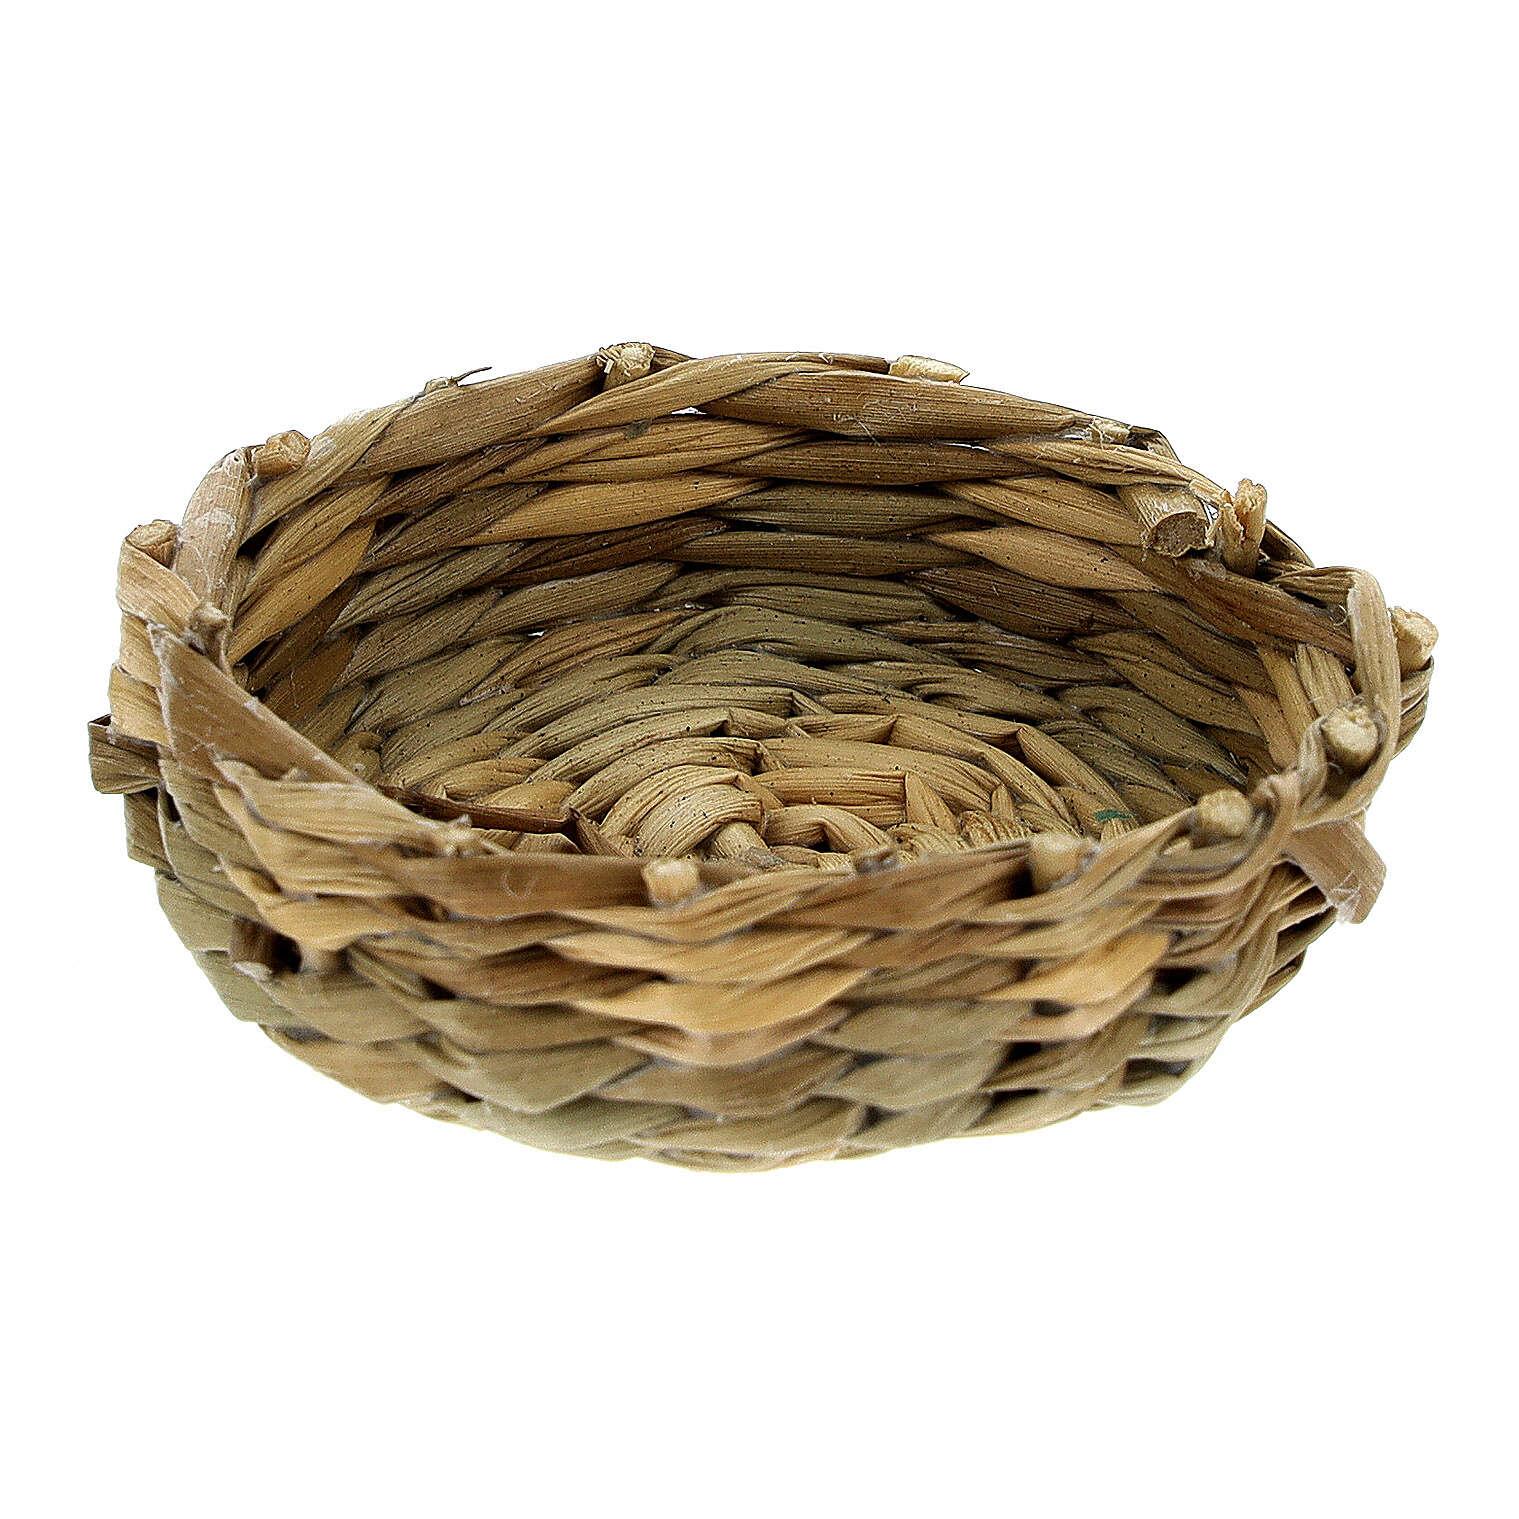 Short basket diameter 4,5 cm for Nativity Scene with 14-16-18 cm figurines 4